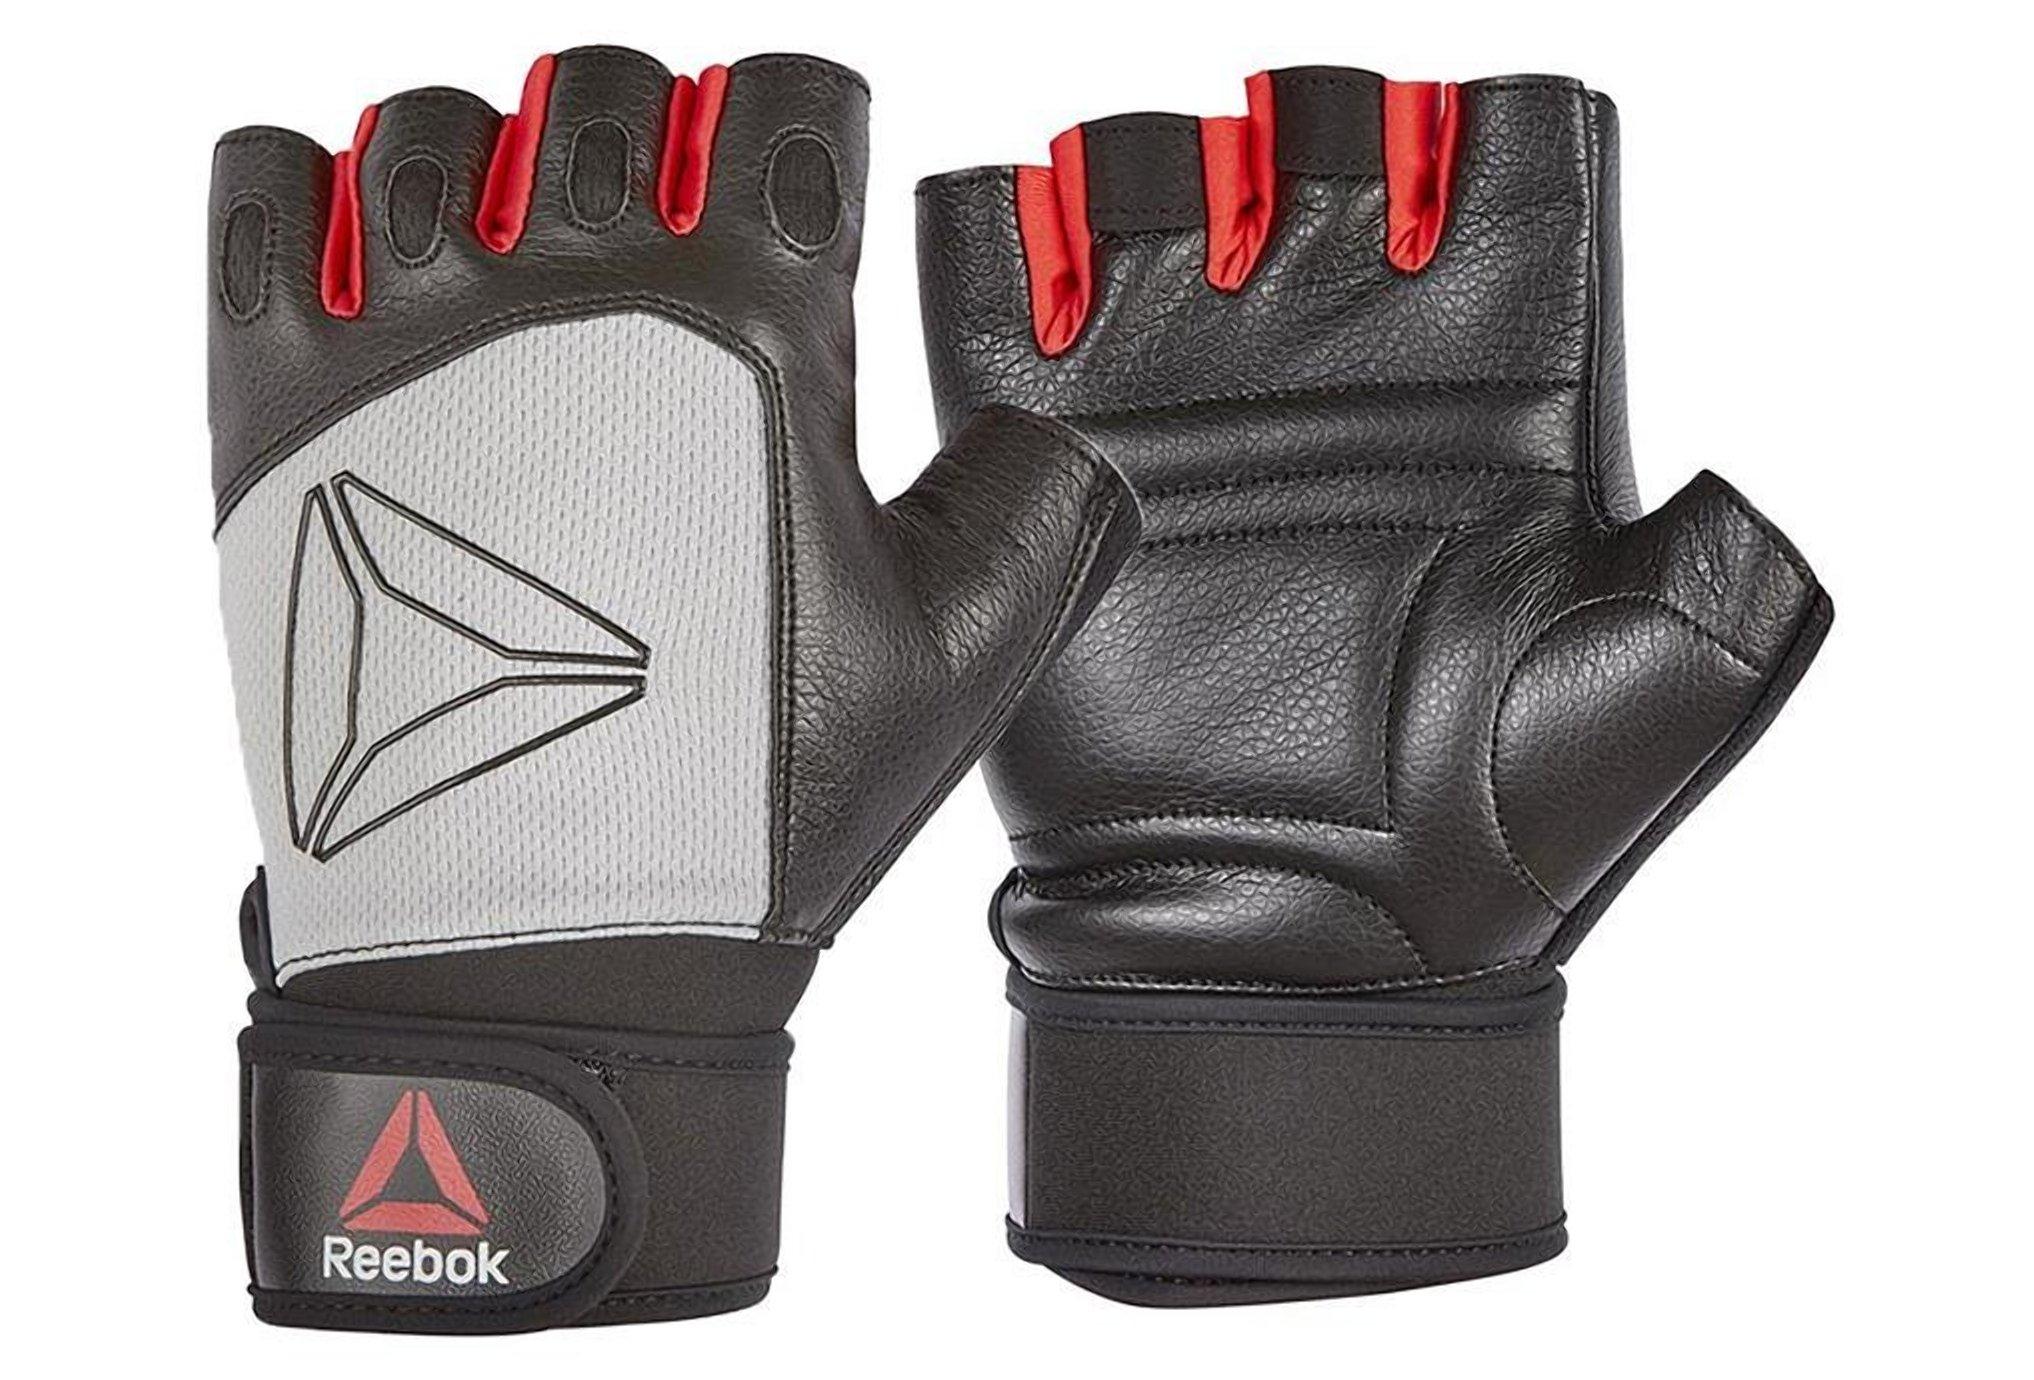 Reebok Lifting Gloves Training